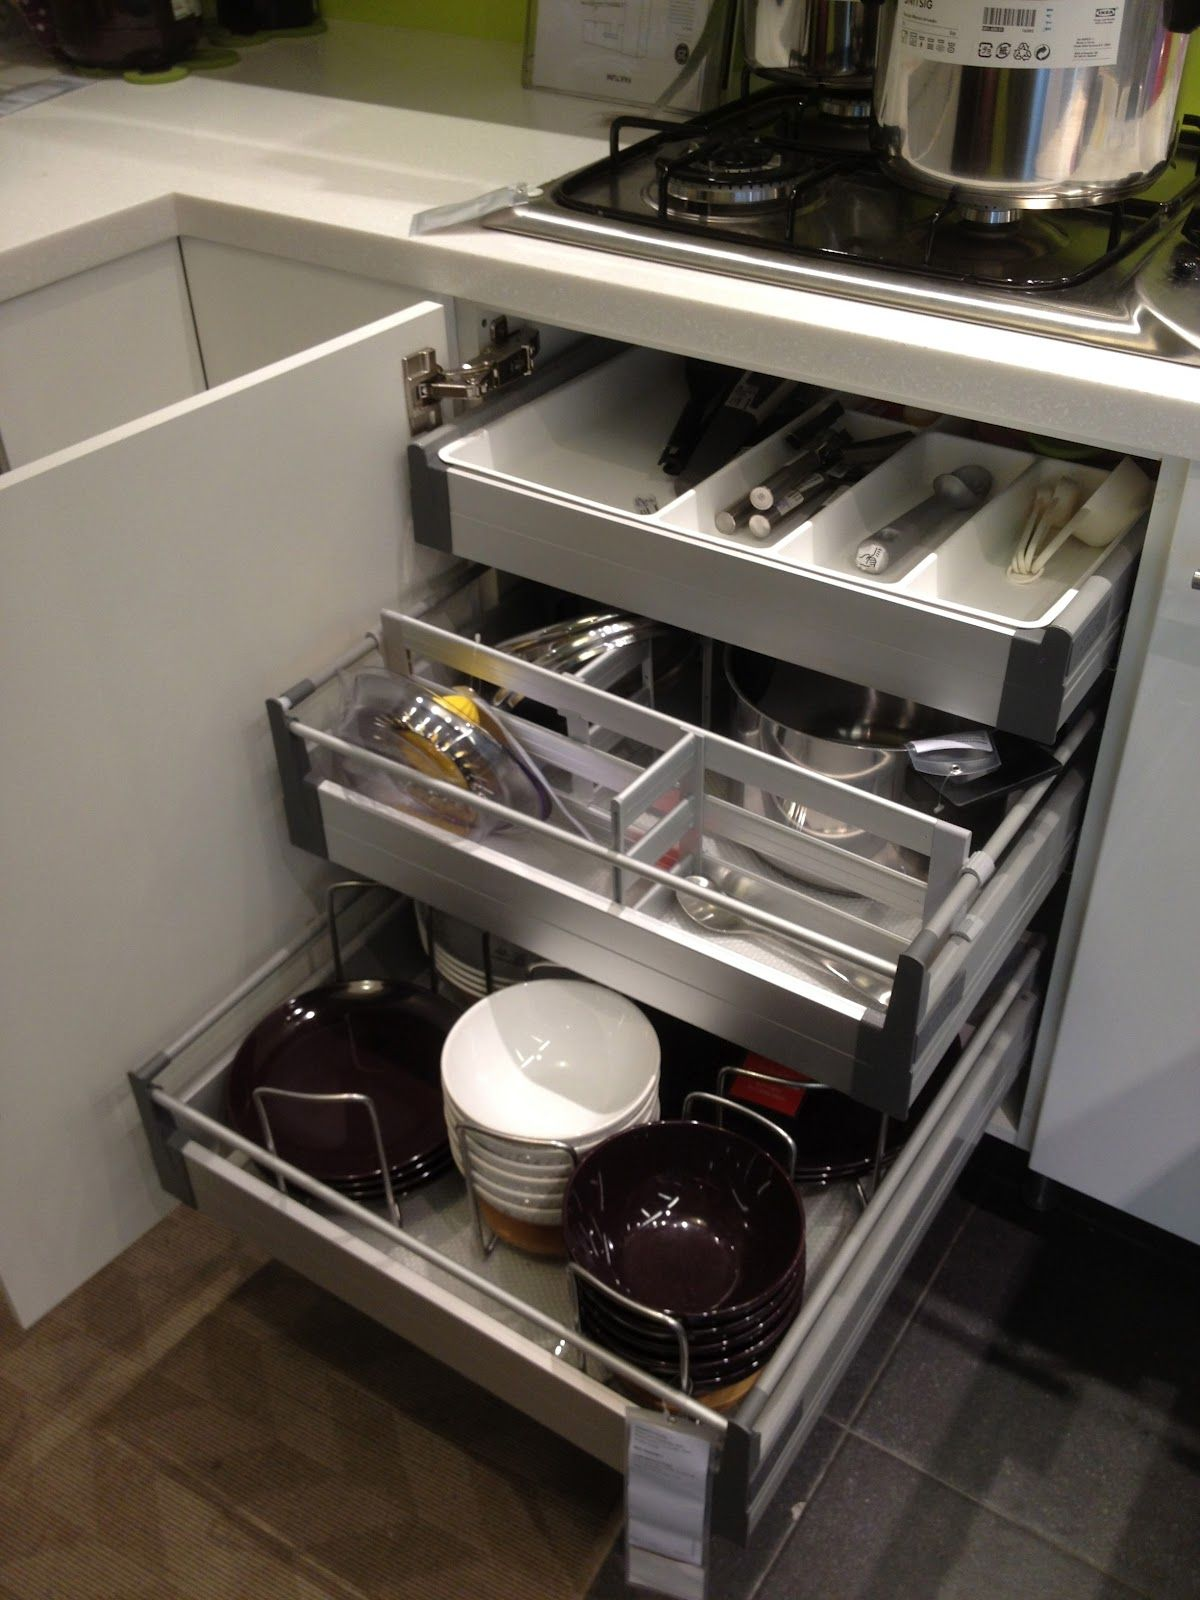 ikea micro kitchen - Google Search | Remodel | Pinterest